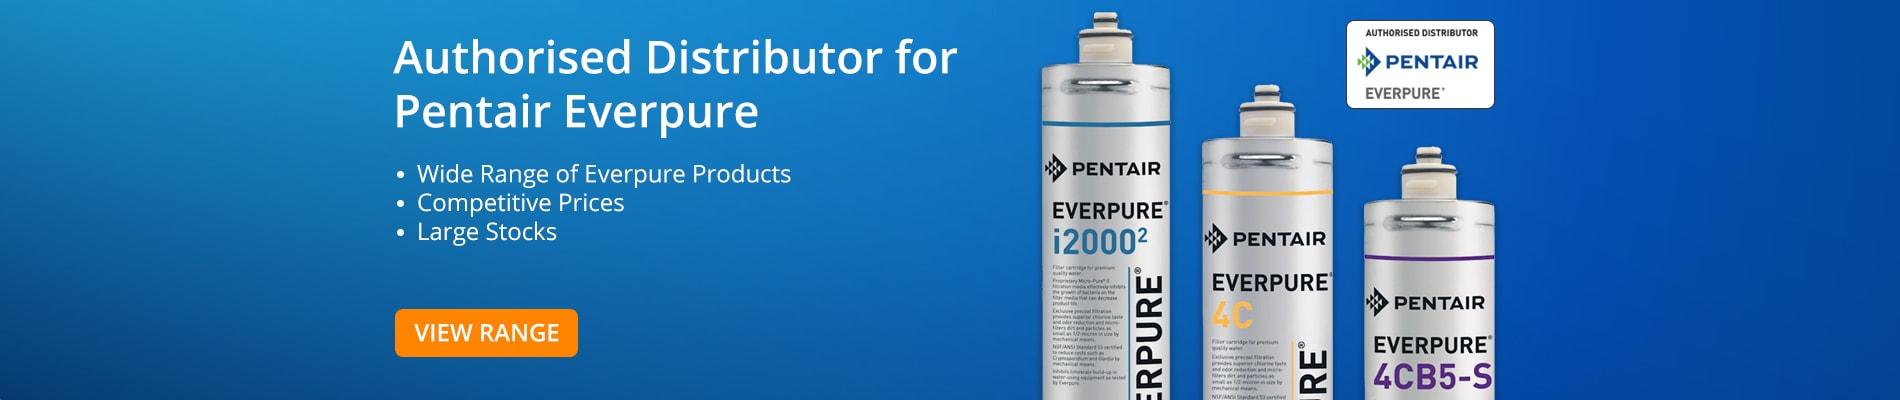 Authorised Distributor for Pentair Everpure